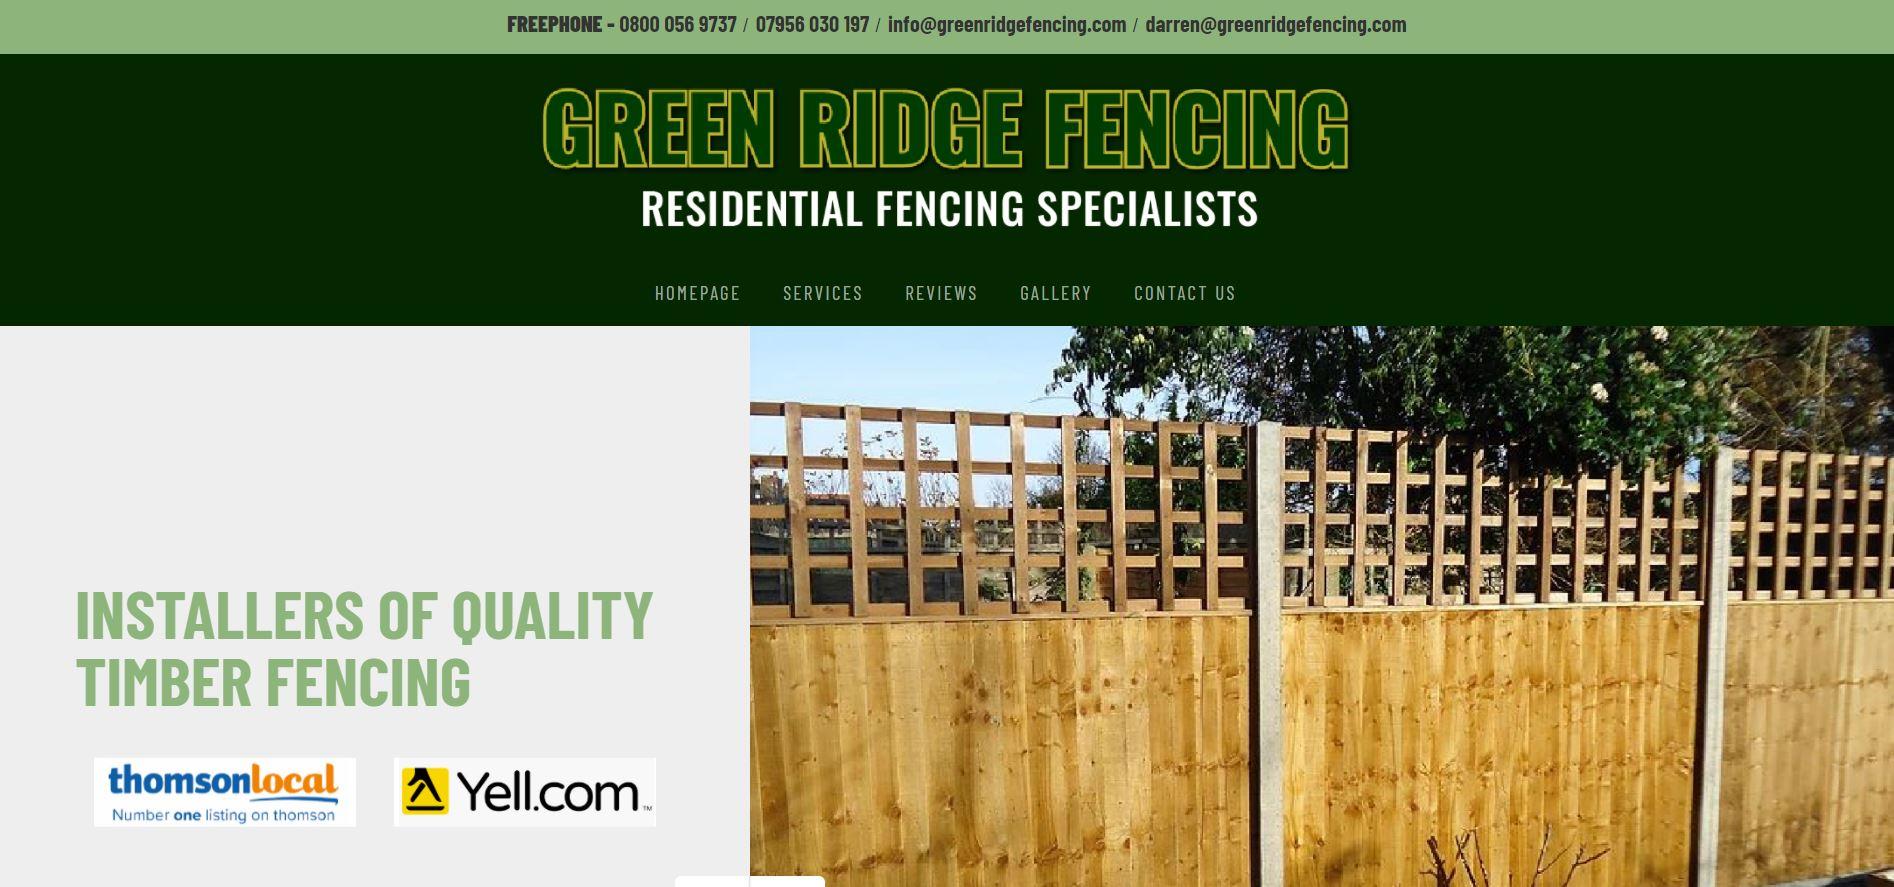 Green Ridge Fencing